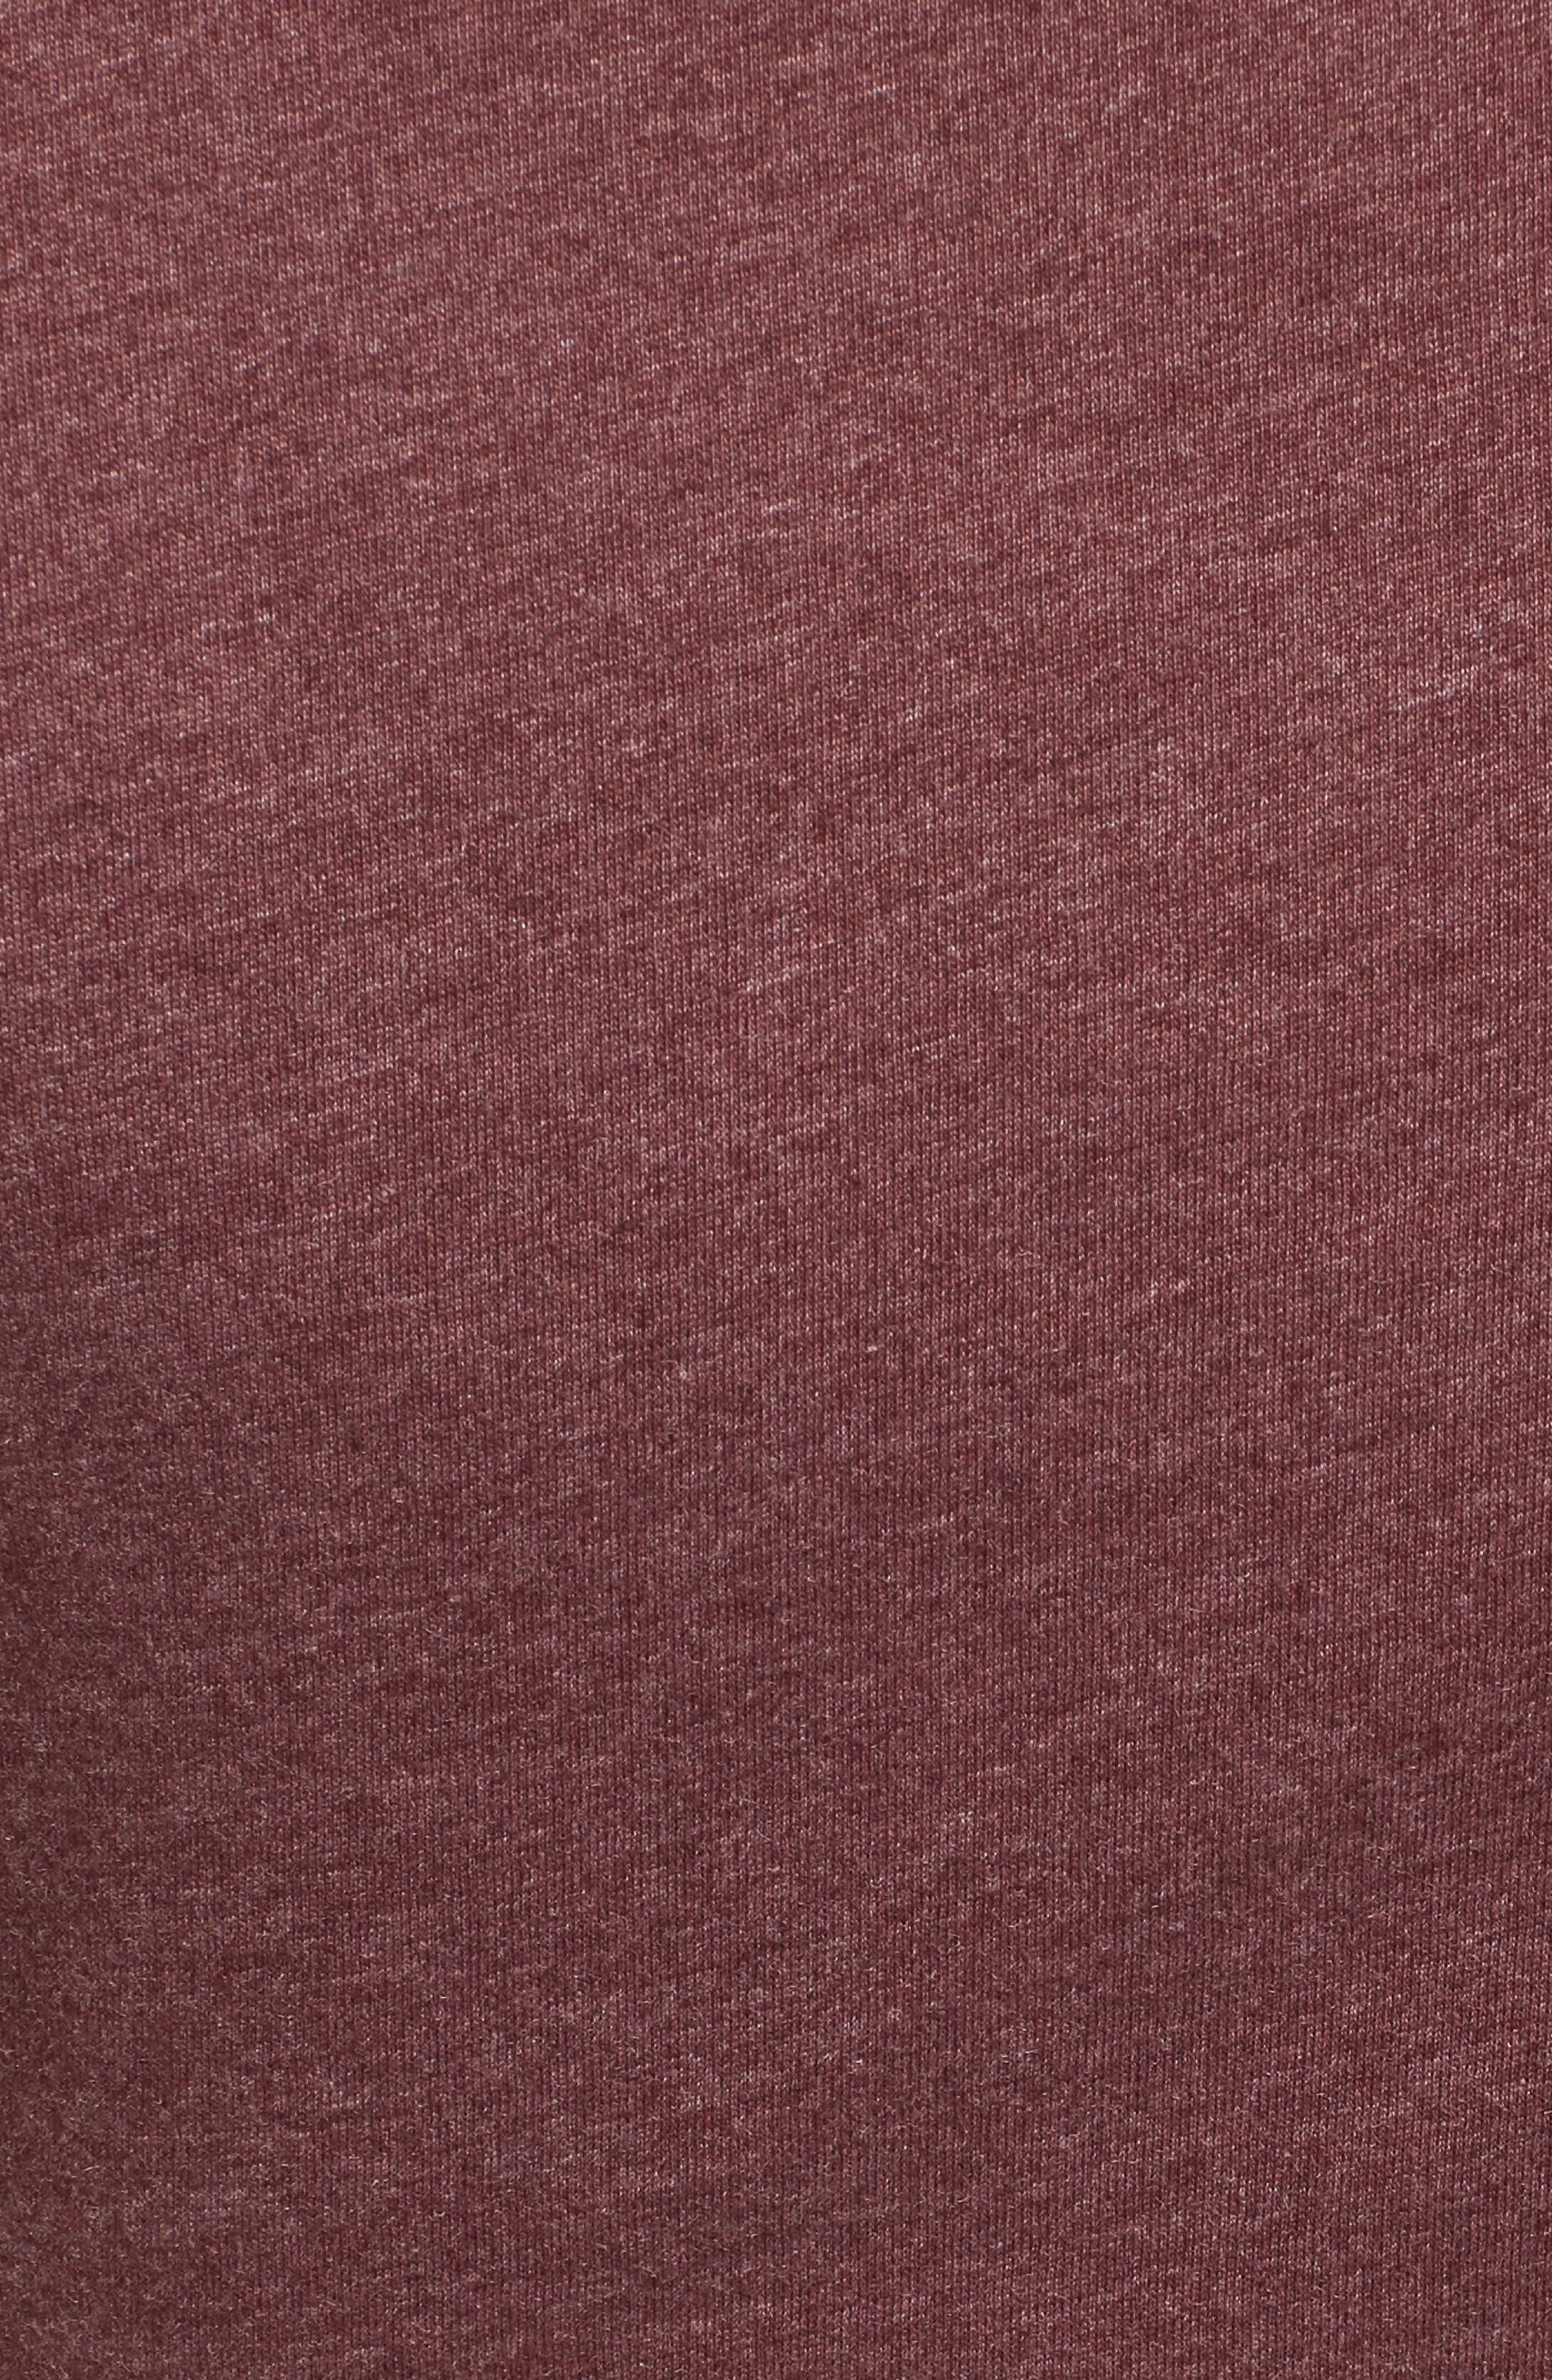 Knot Front Cutout T-Shirt Dress,                             Alternate thumbnail 5, color,                             Burgundy